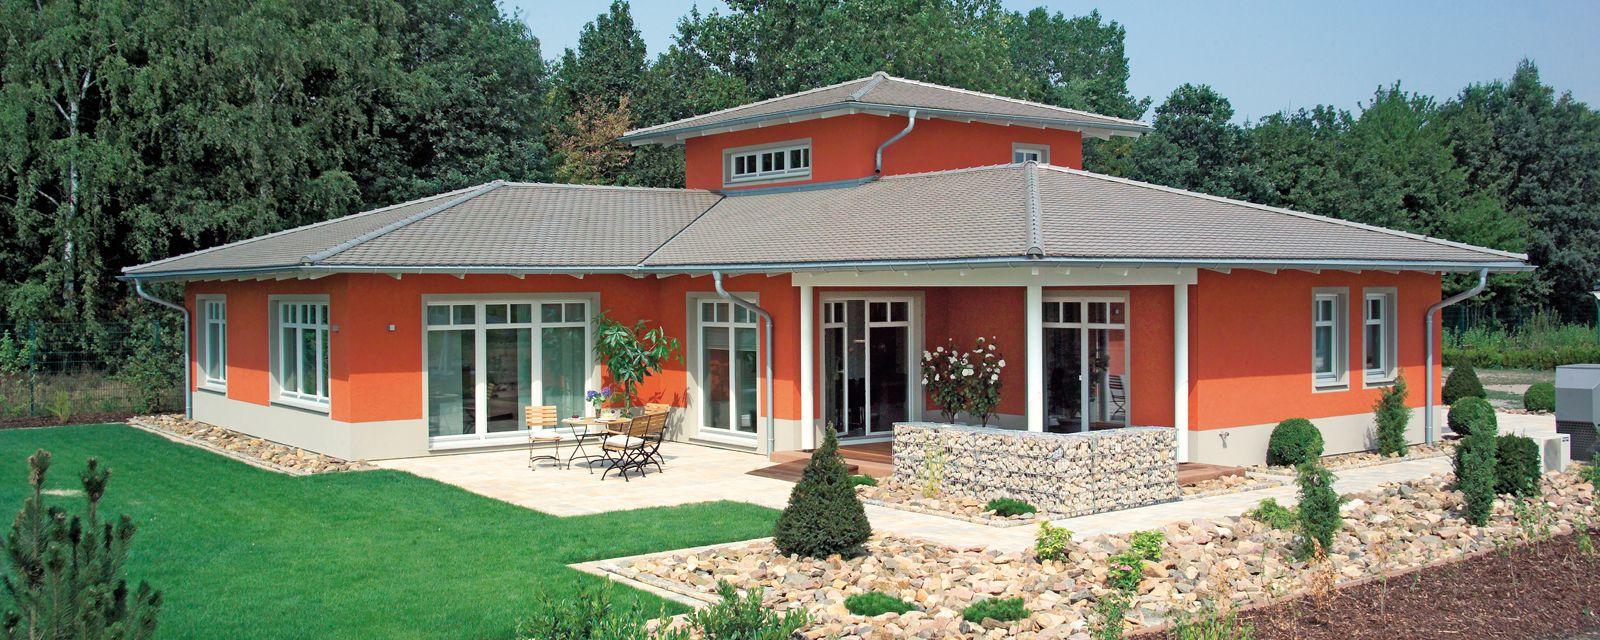 bungalow fertighaus bauen bungalow haus bauen outdoor structures bungalow outdoor